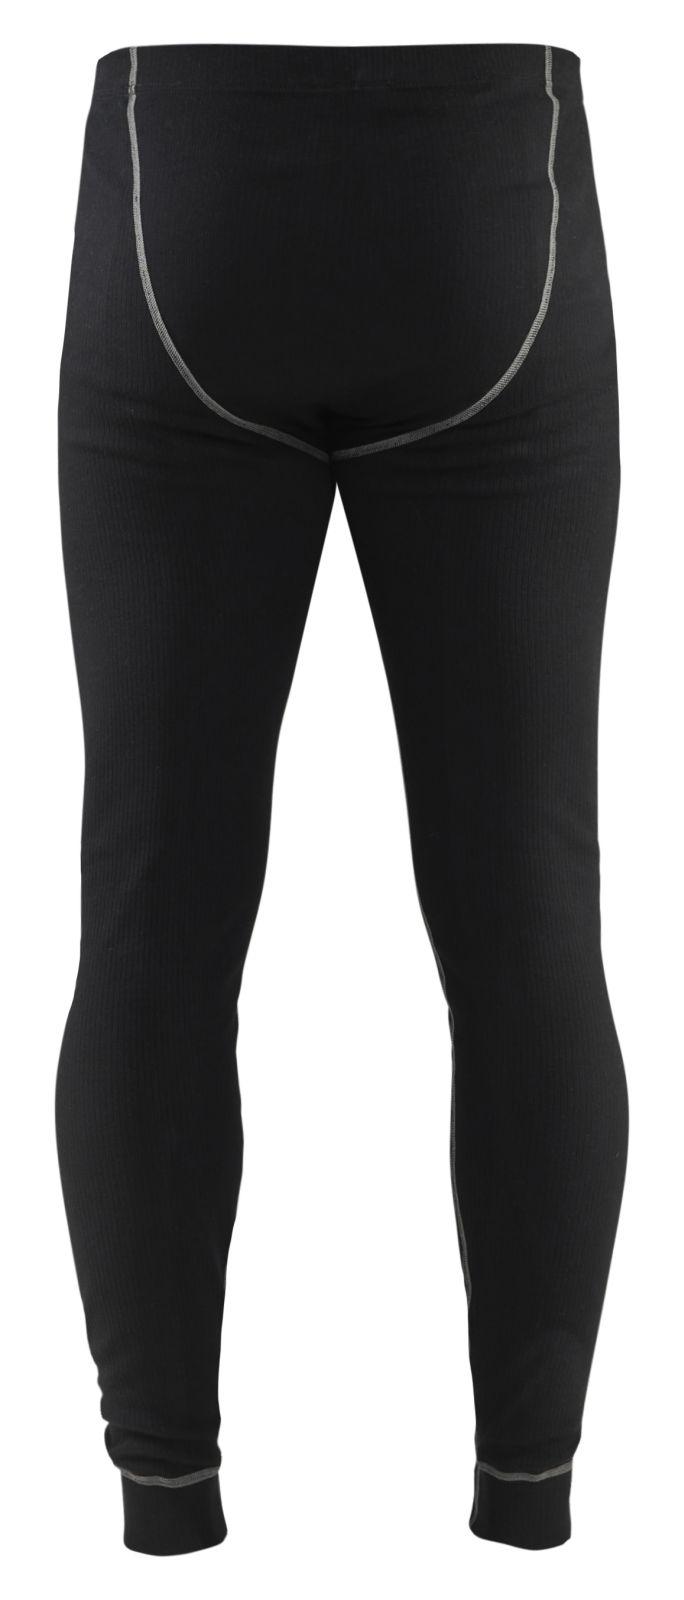 Blaklader Lange onderbroeken 18981725 Vlamvertragend zwart(9900)